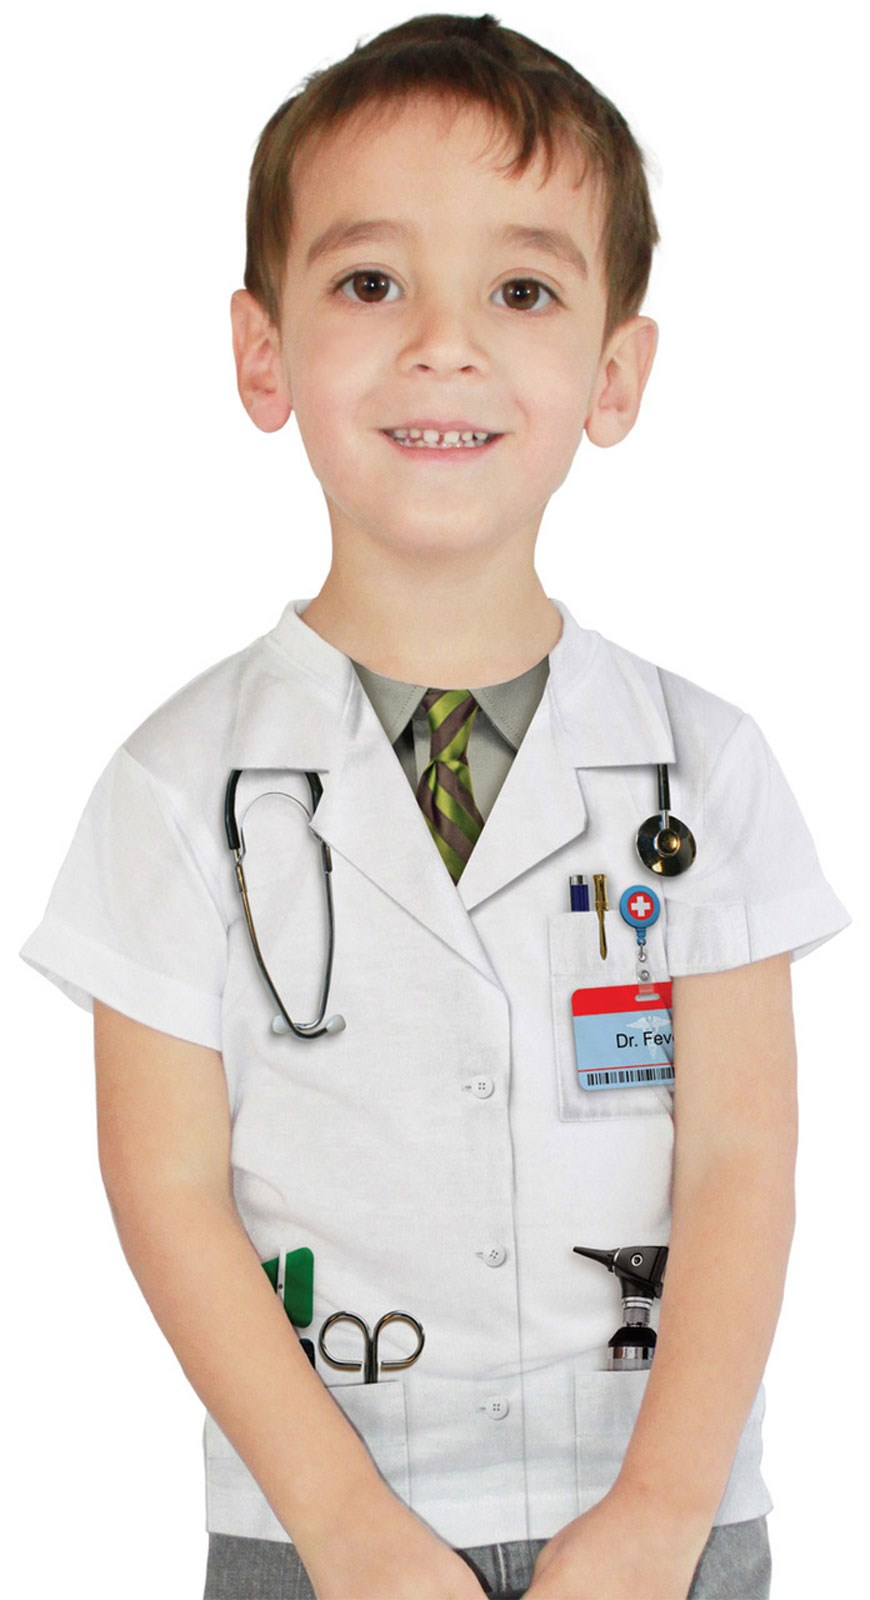 Toddler Doctor Fever T-Shirt